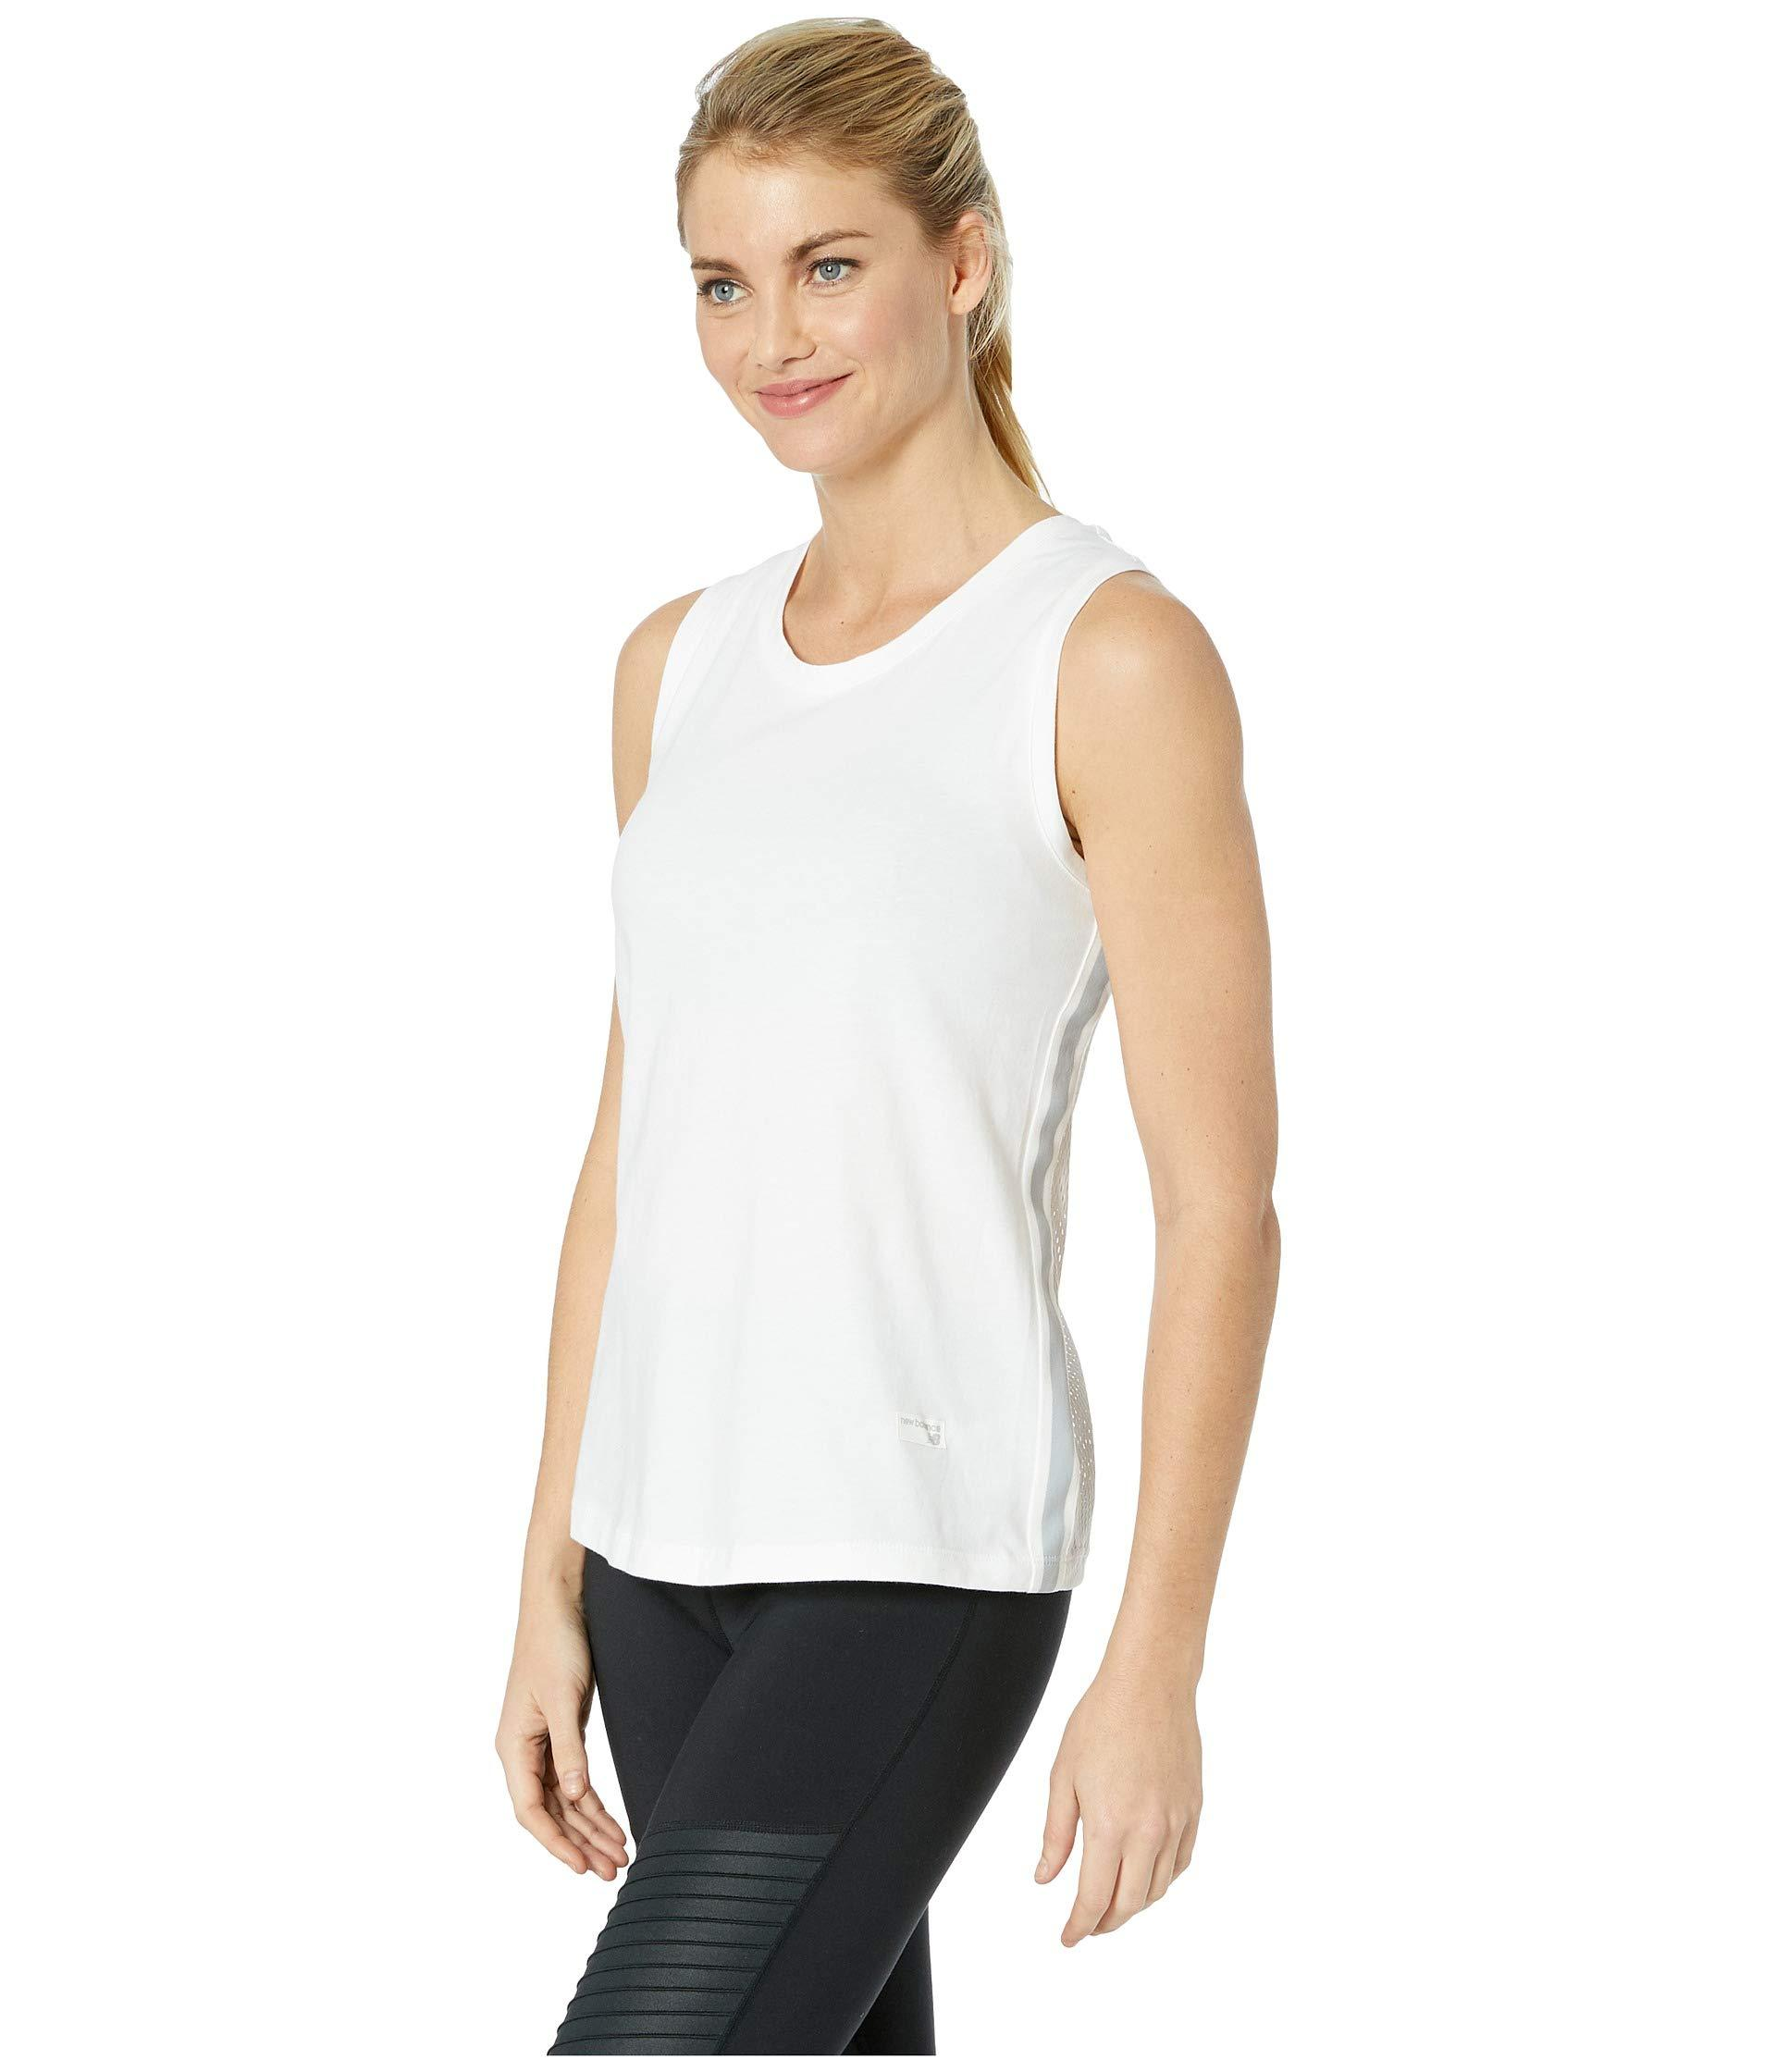 583eed70077fd Lyst - New Balance Athletics Racerback Tank Top (black white) Women s  Sleeveless in White